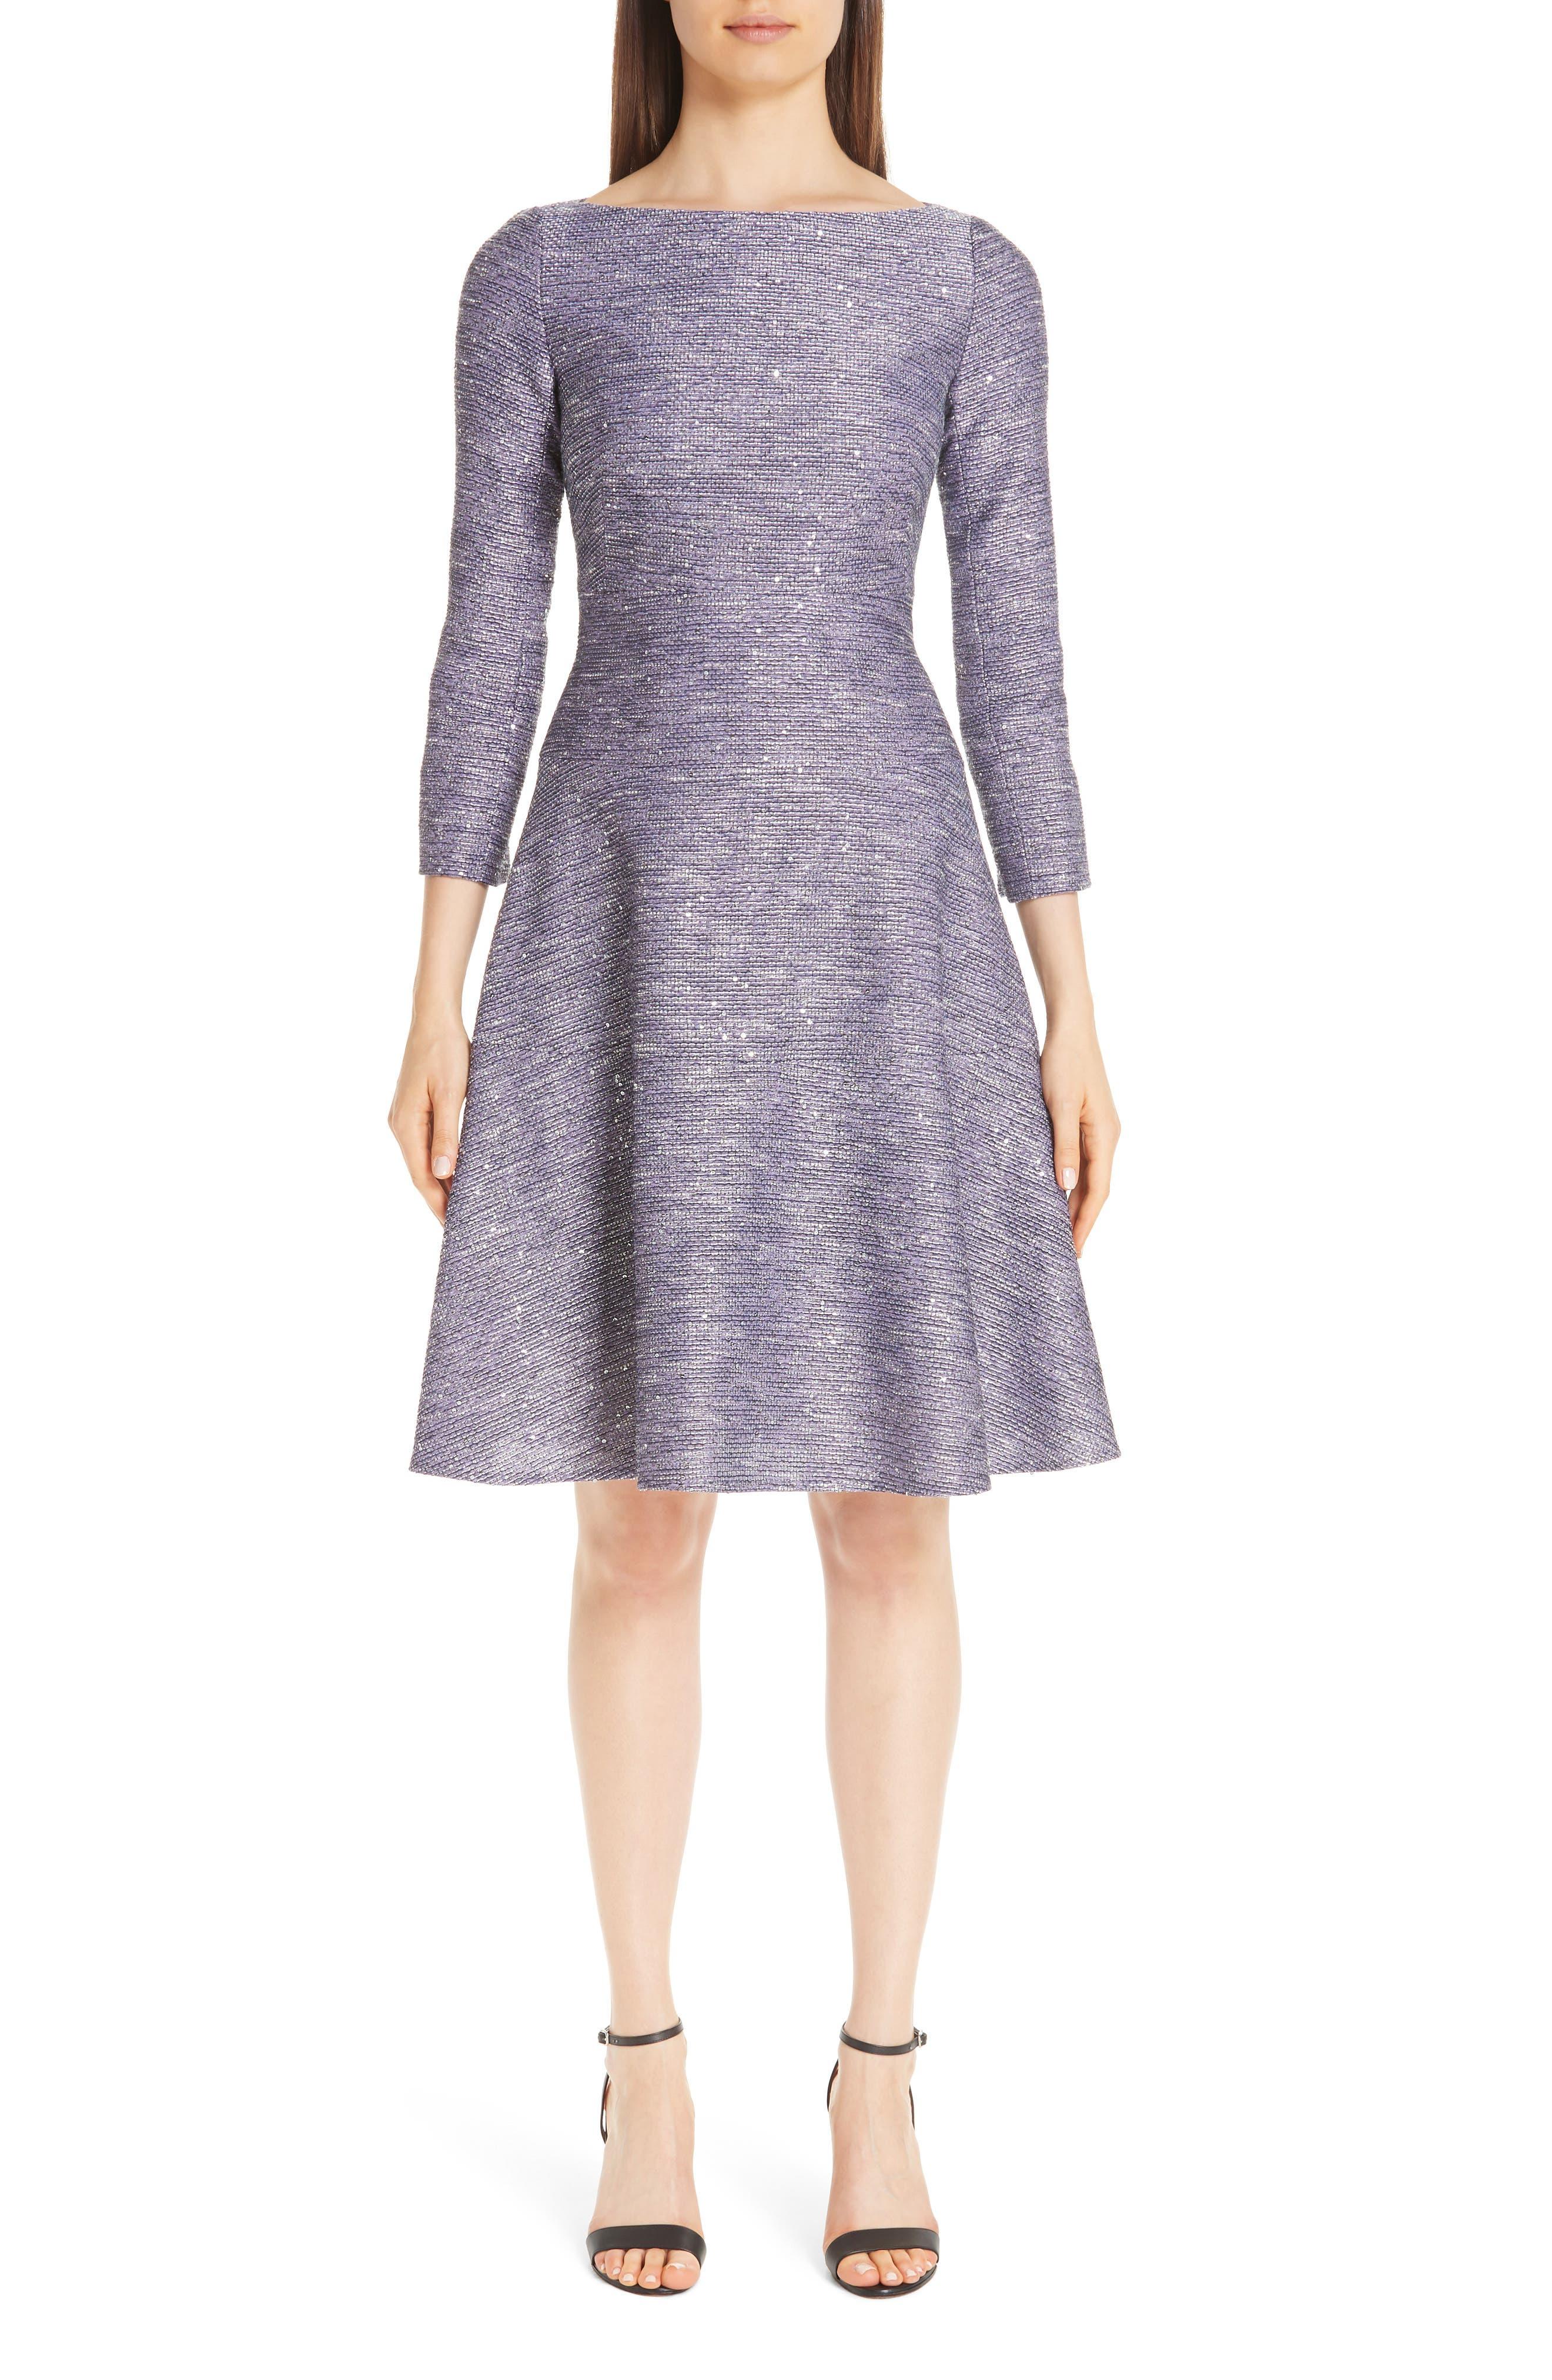 Lela Rose Sequin Tweed Fit & Flare Dress, Purple